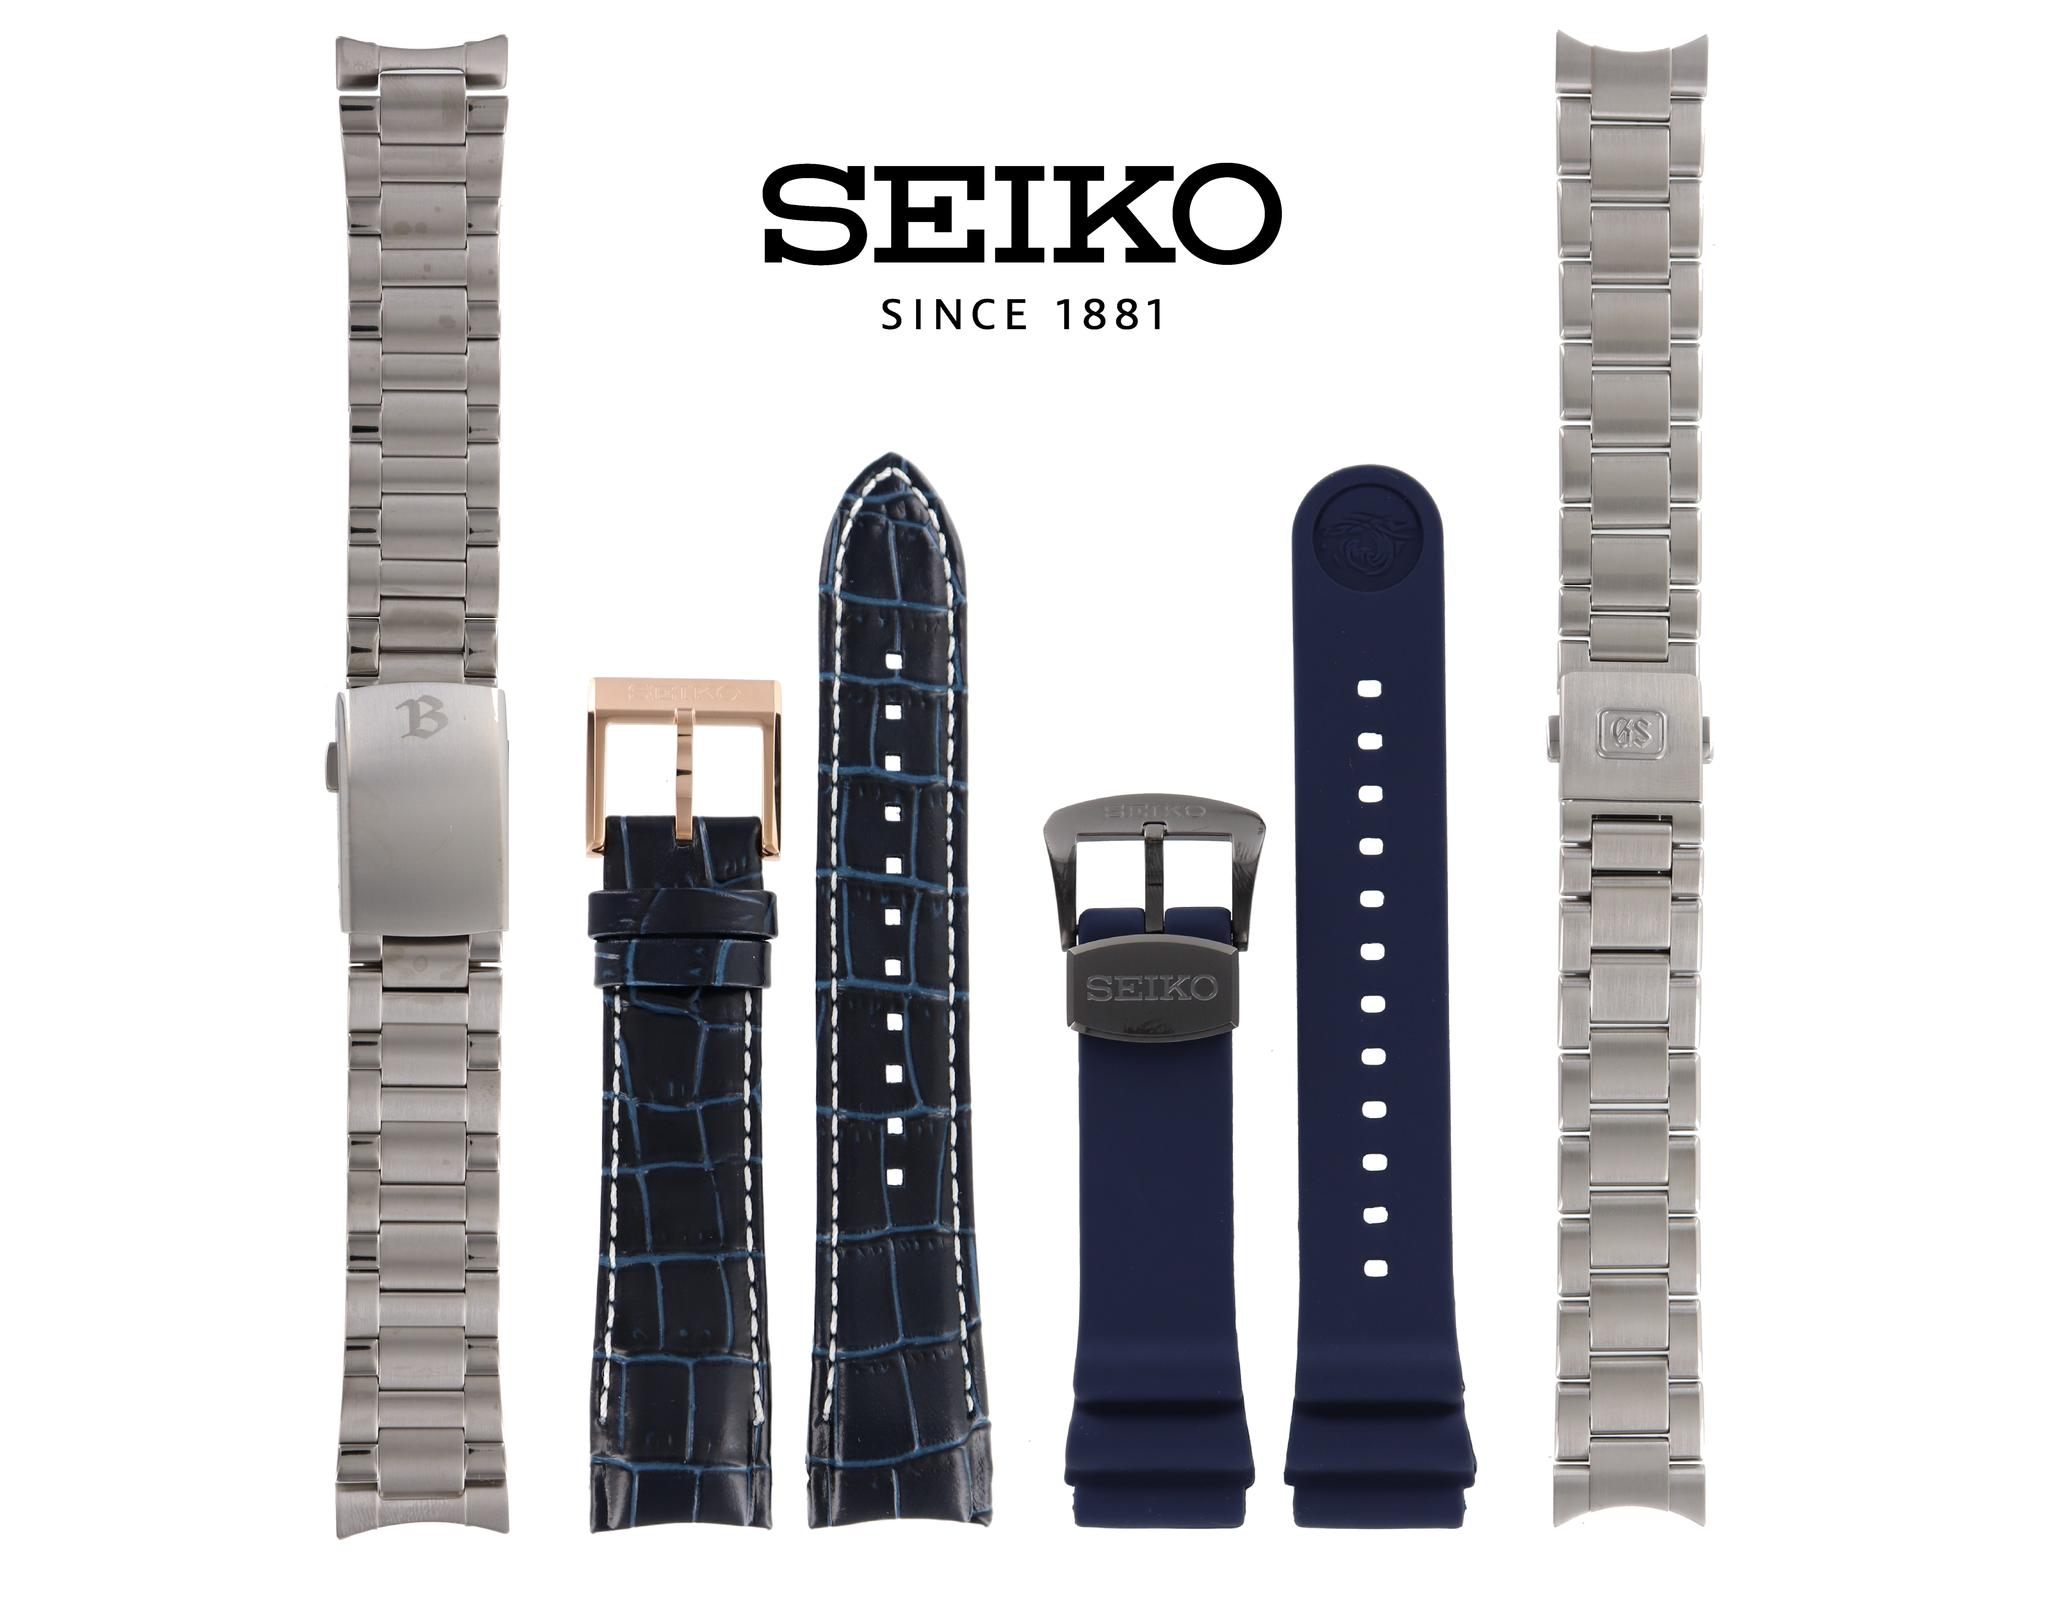 Seiko Watch Bands